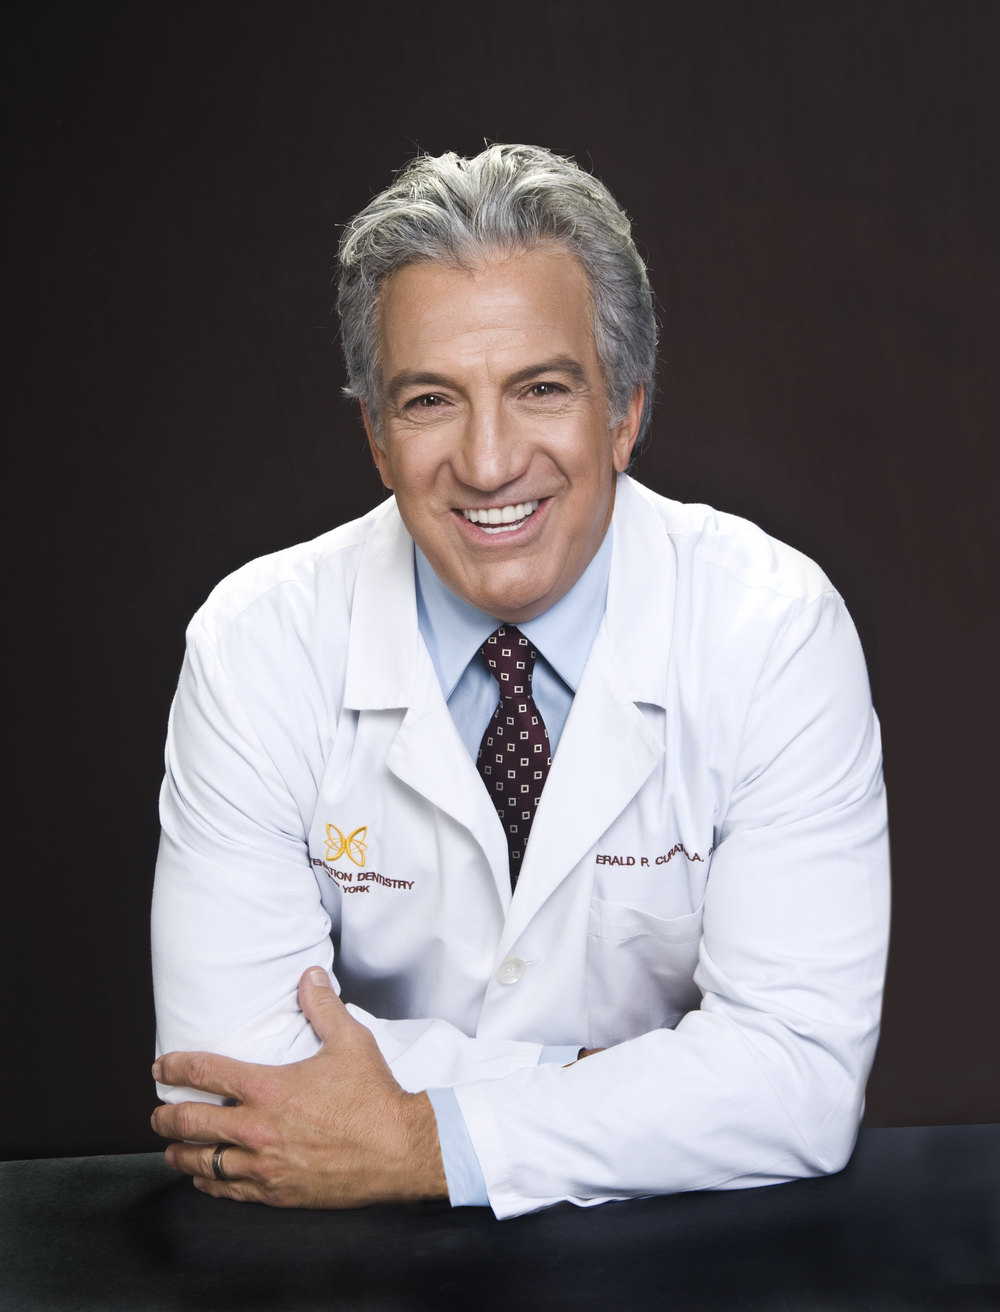 Dr. Curatola